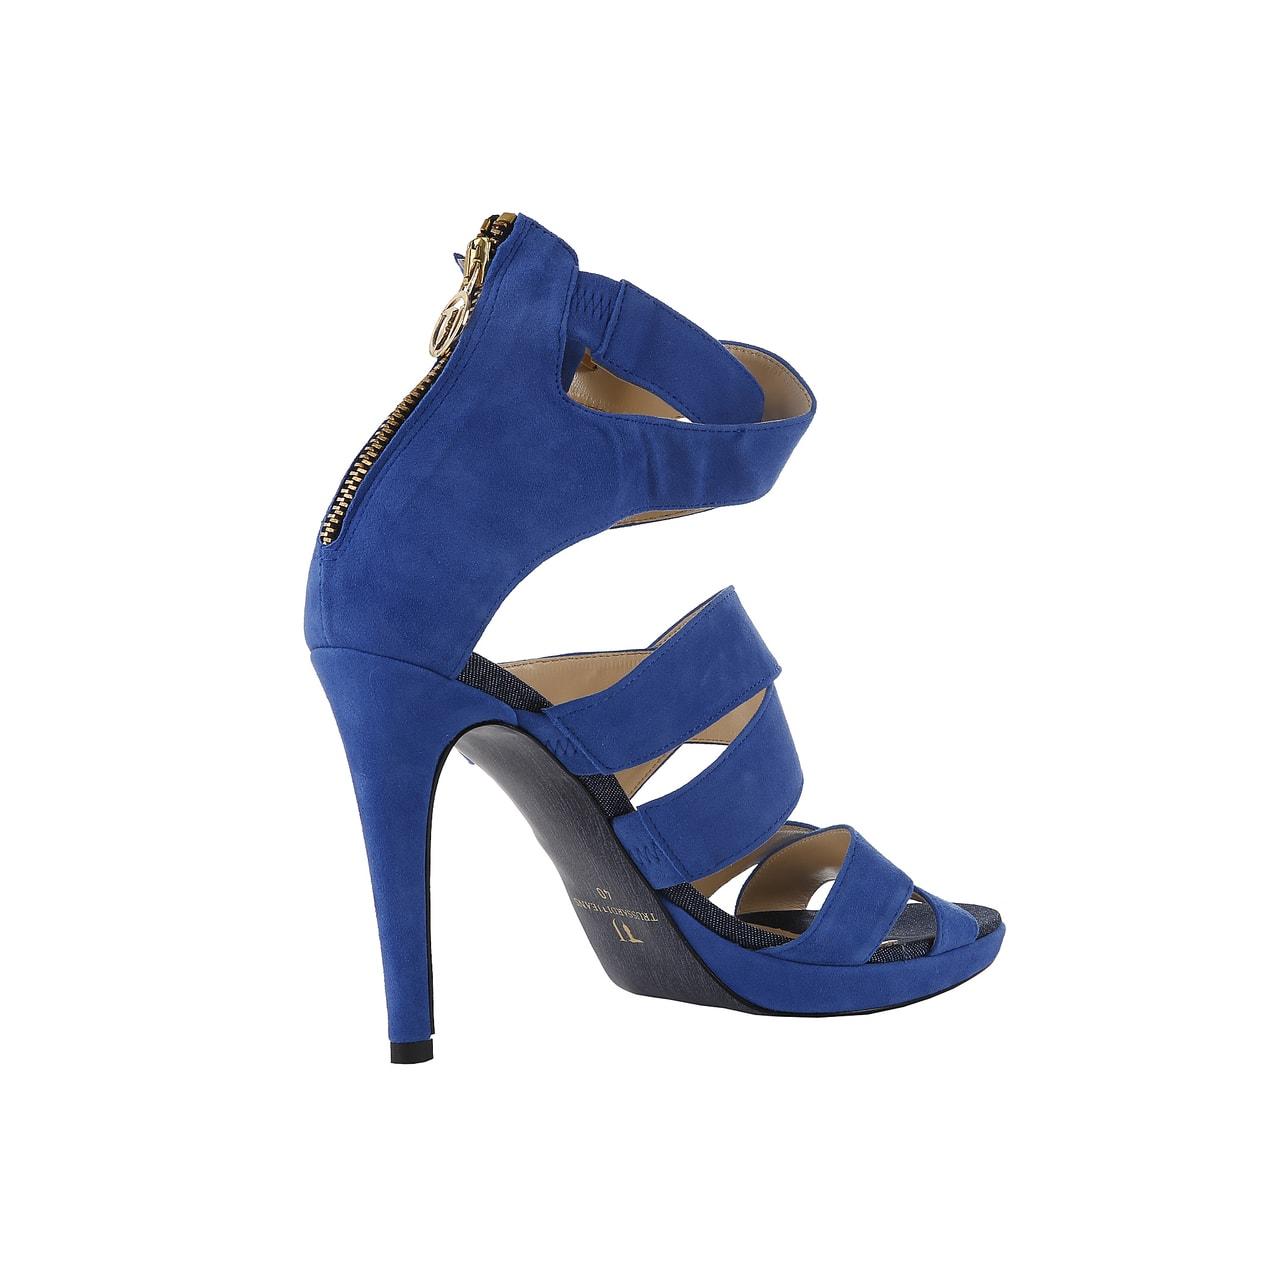 Glamadise.sk - Trussardi páskové sandále modré - Trussardi - Sandále ... fb4301e363